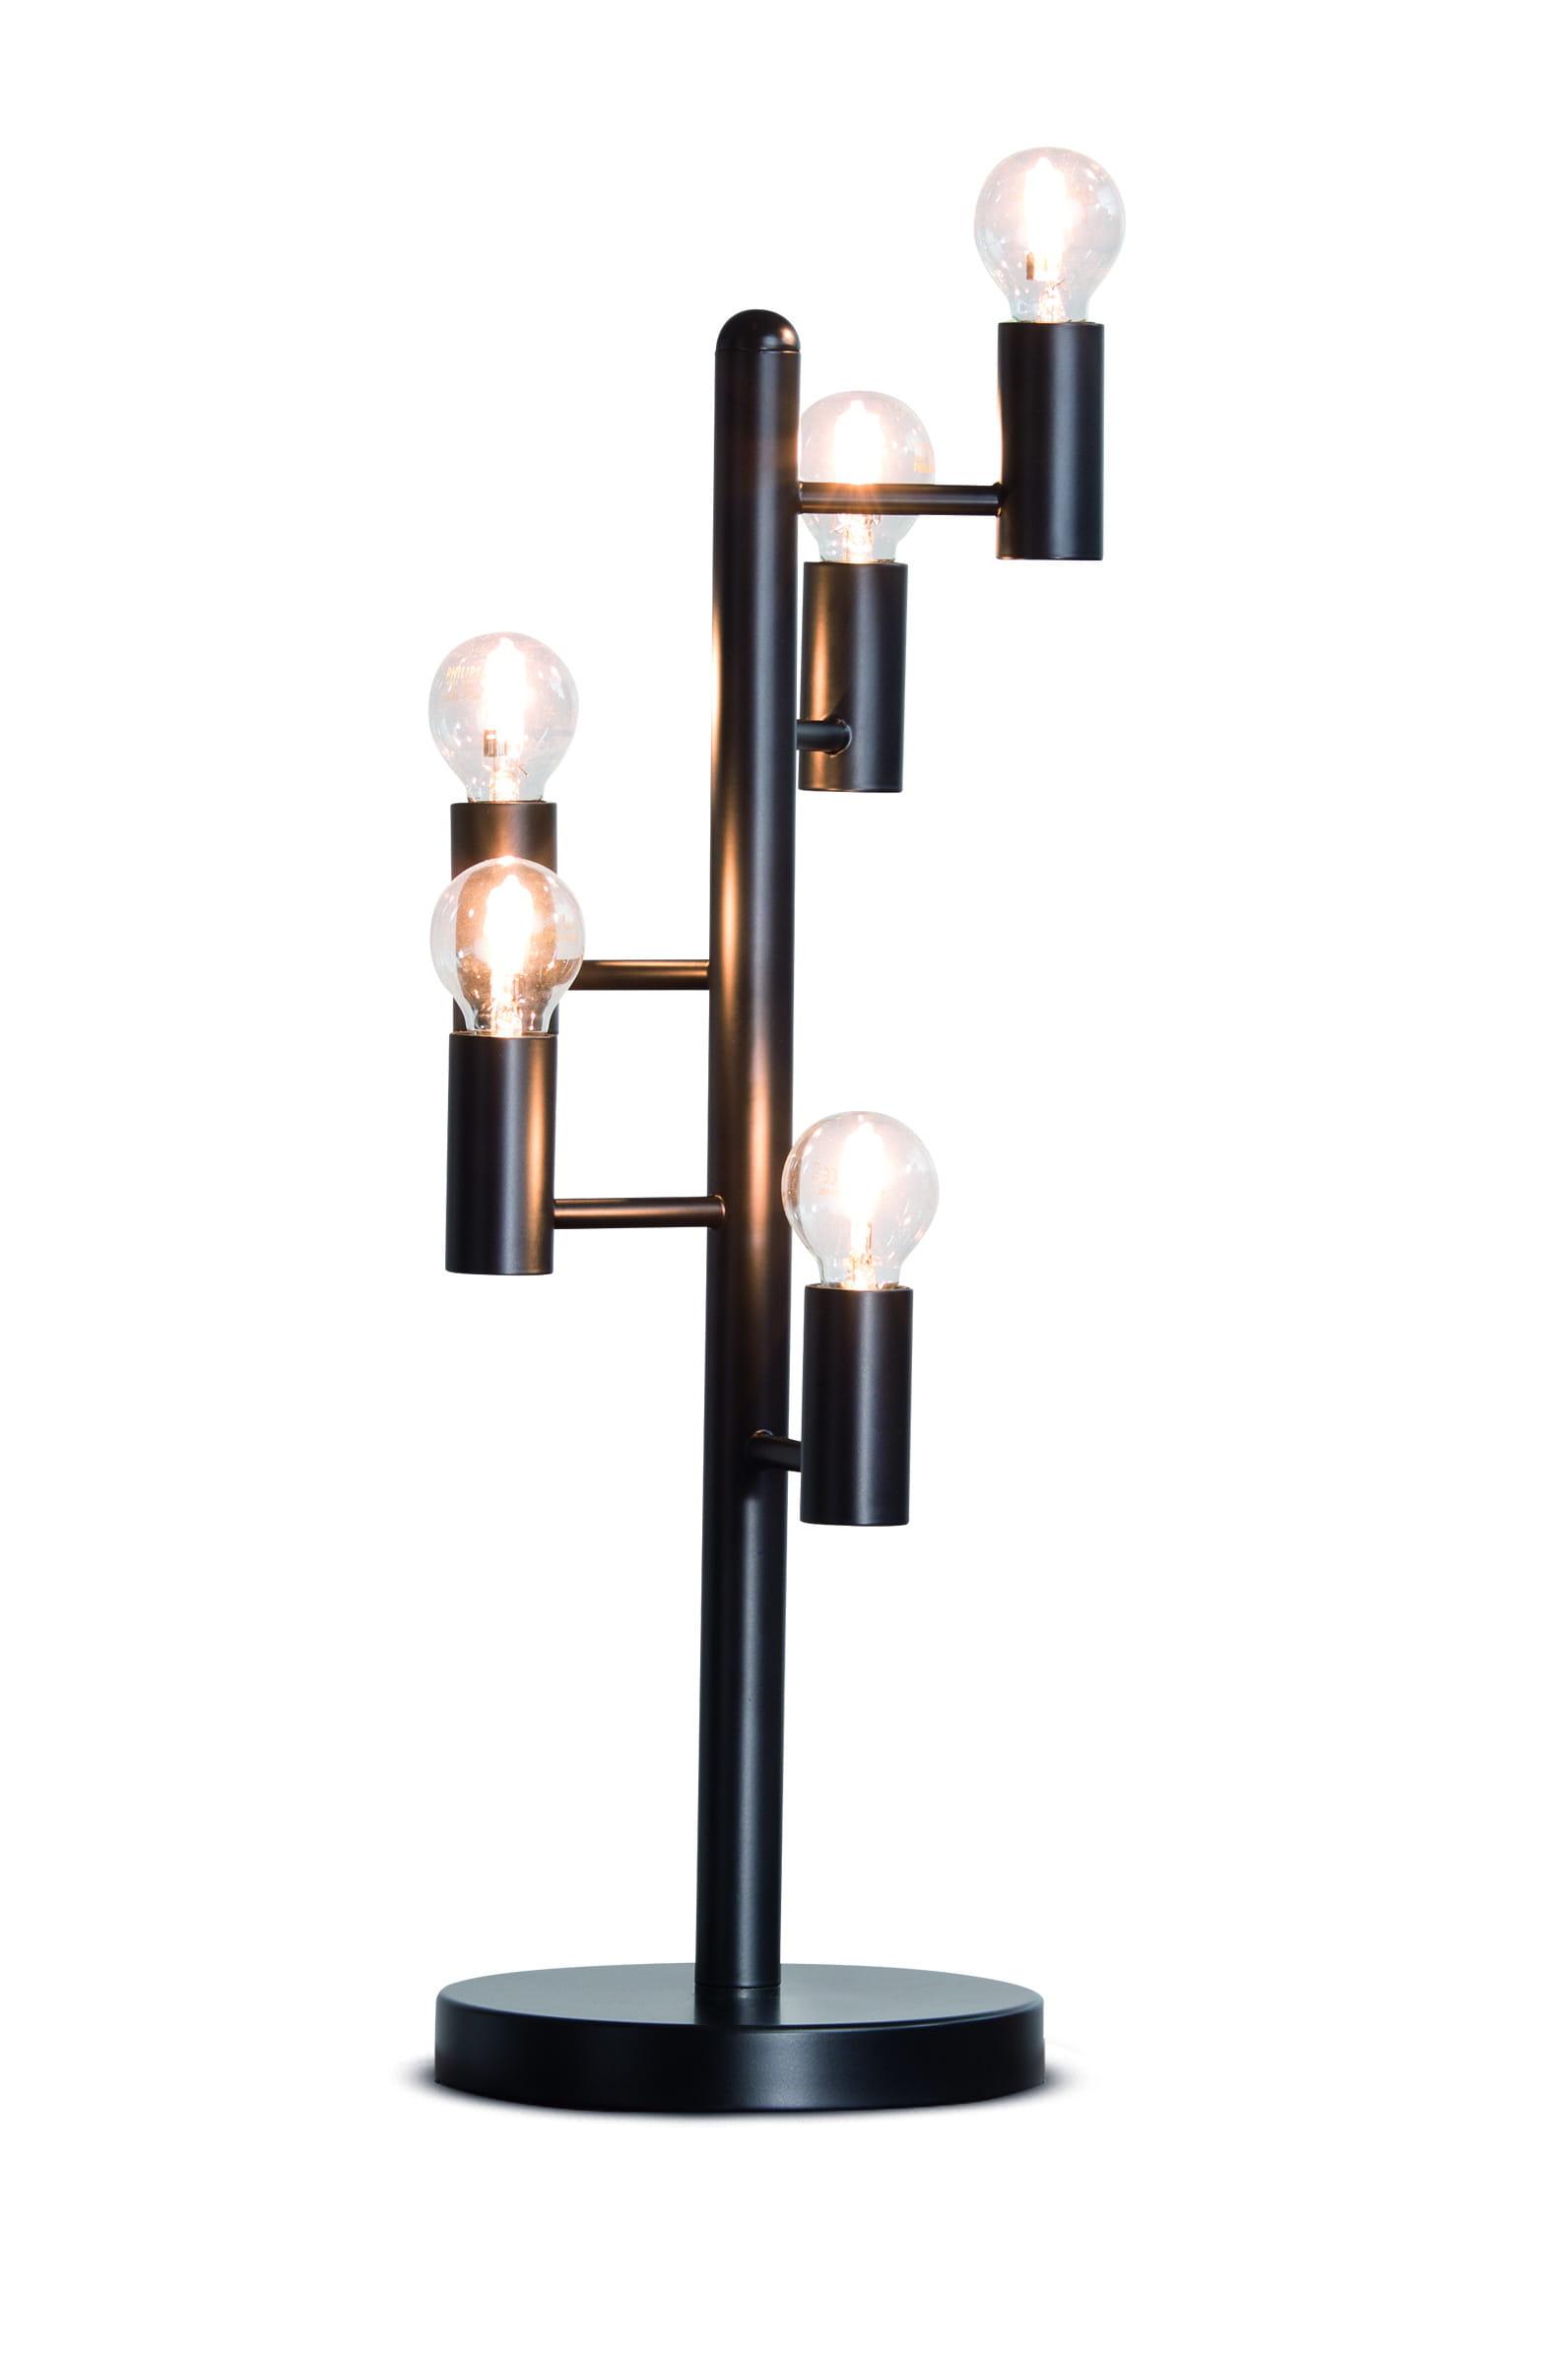 lampe opera de petit prix pour d co lumineuse. Black Bedroom Furniture Sets. Home Design Ideas